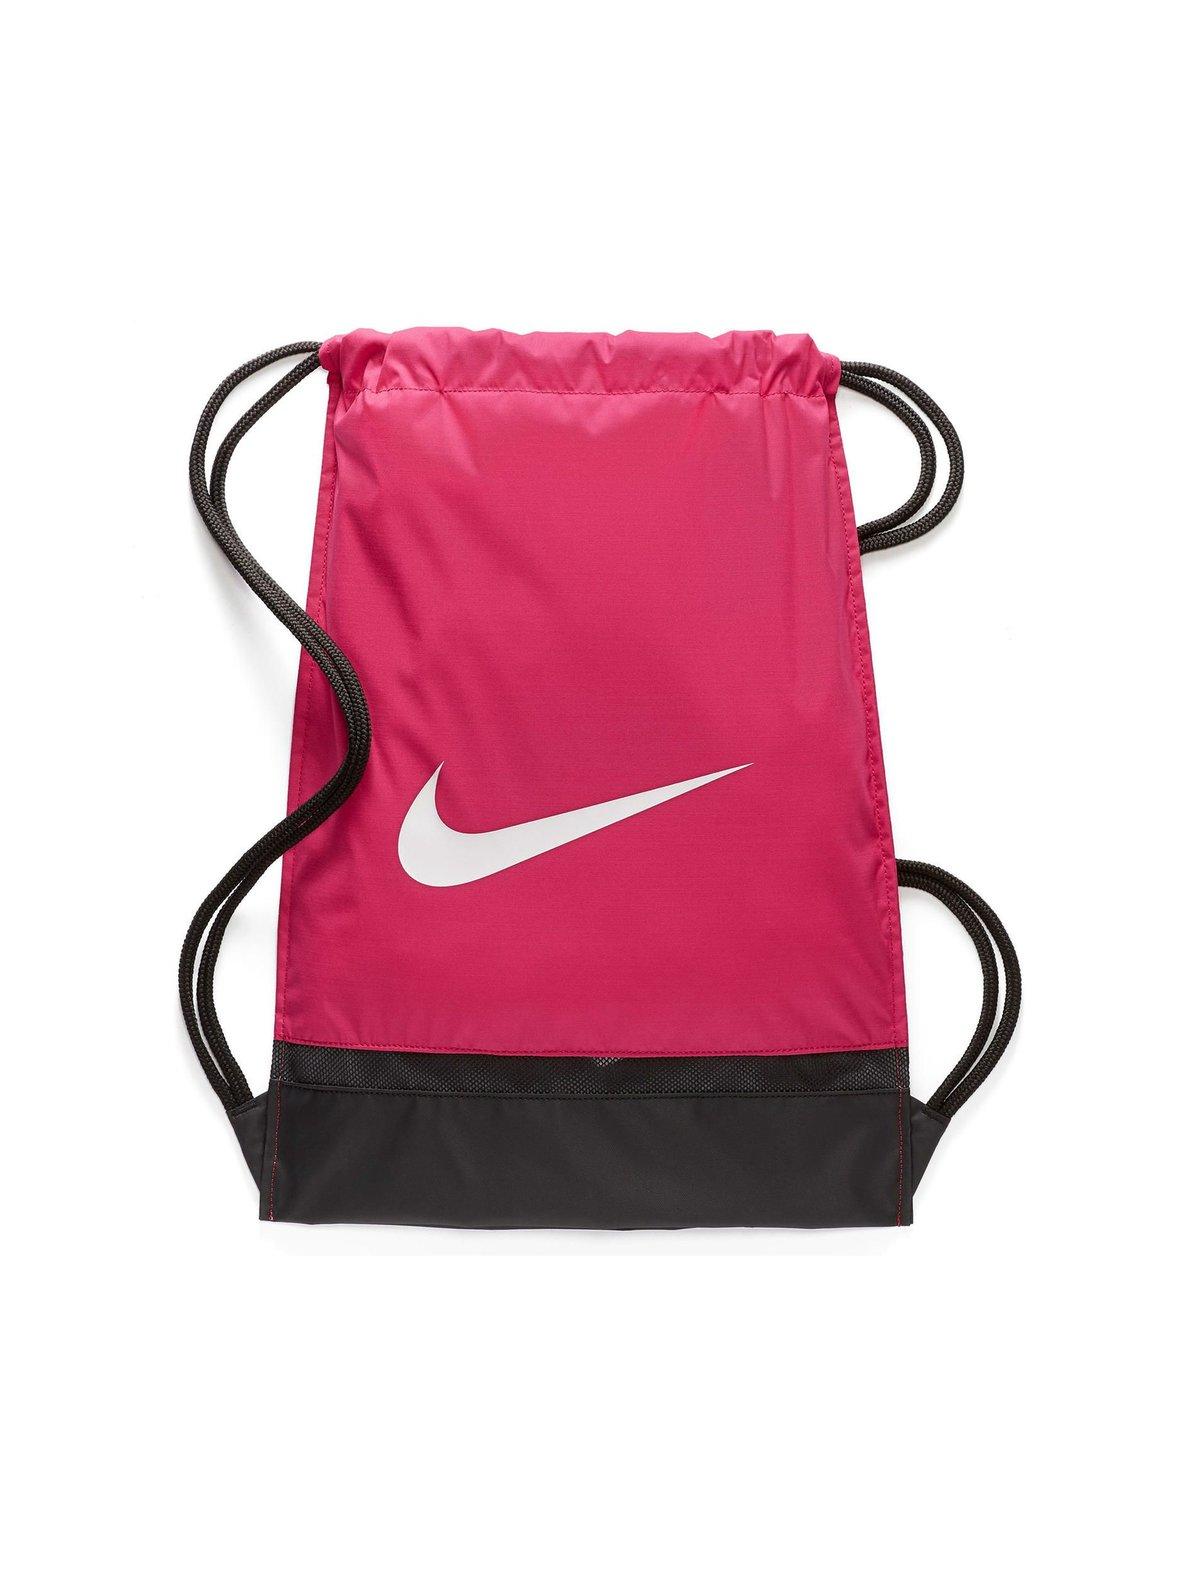 Rush Pink (pinkki) Nike Brasilia-treenikassi BA5338-666  954ff621bf